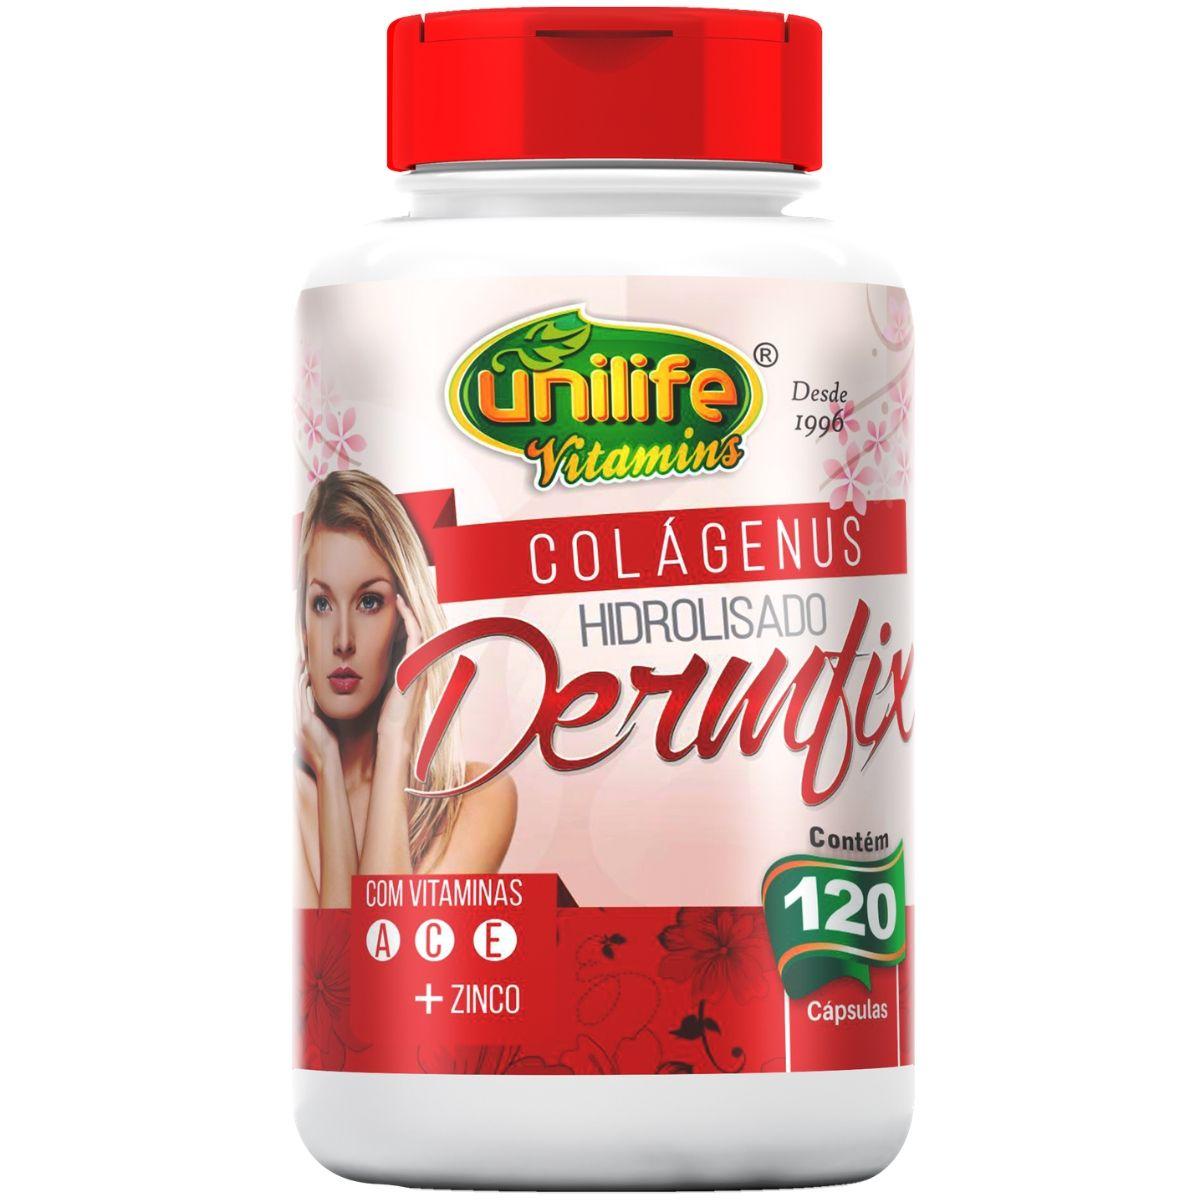 Colageno Hidrolisado Dermfix C/ Vitaminas 120 Cápsulas 450mg - Unilife